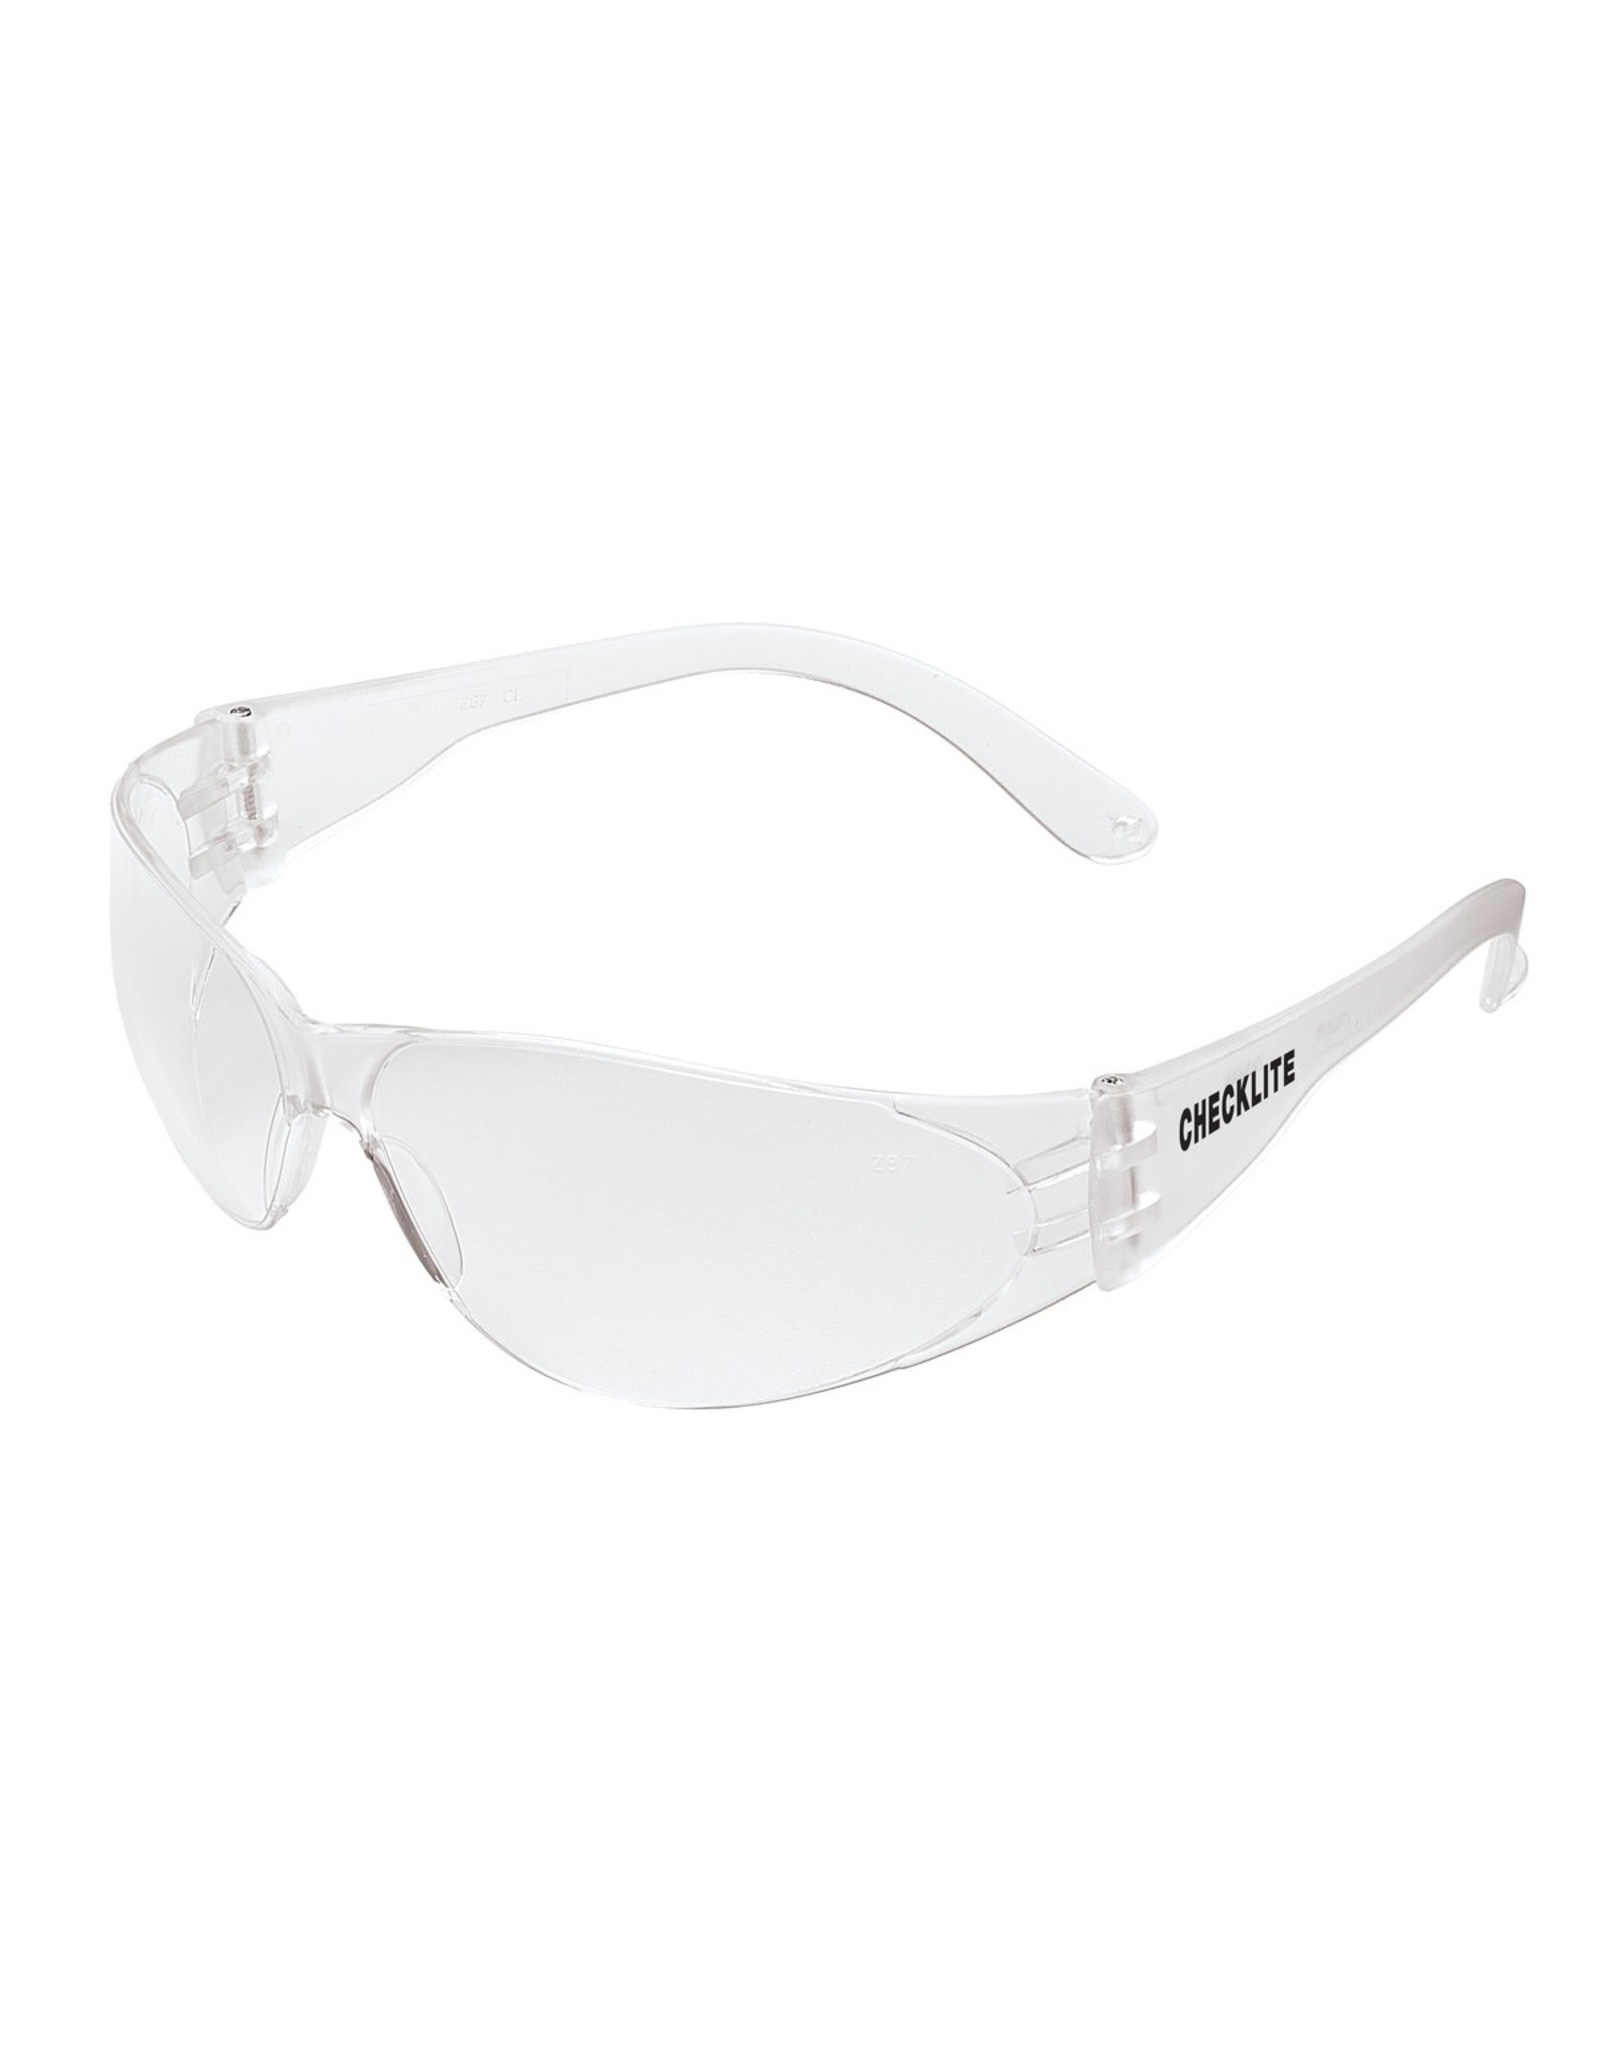 MCR Safety MCR Safety Checklite Safety Glasses